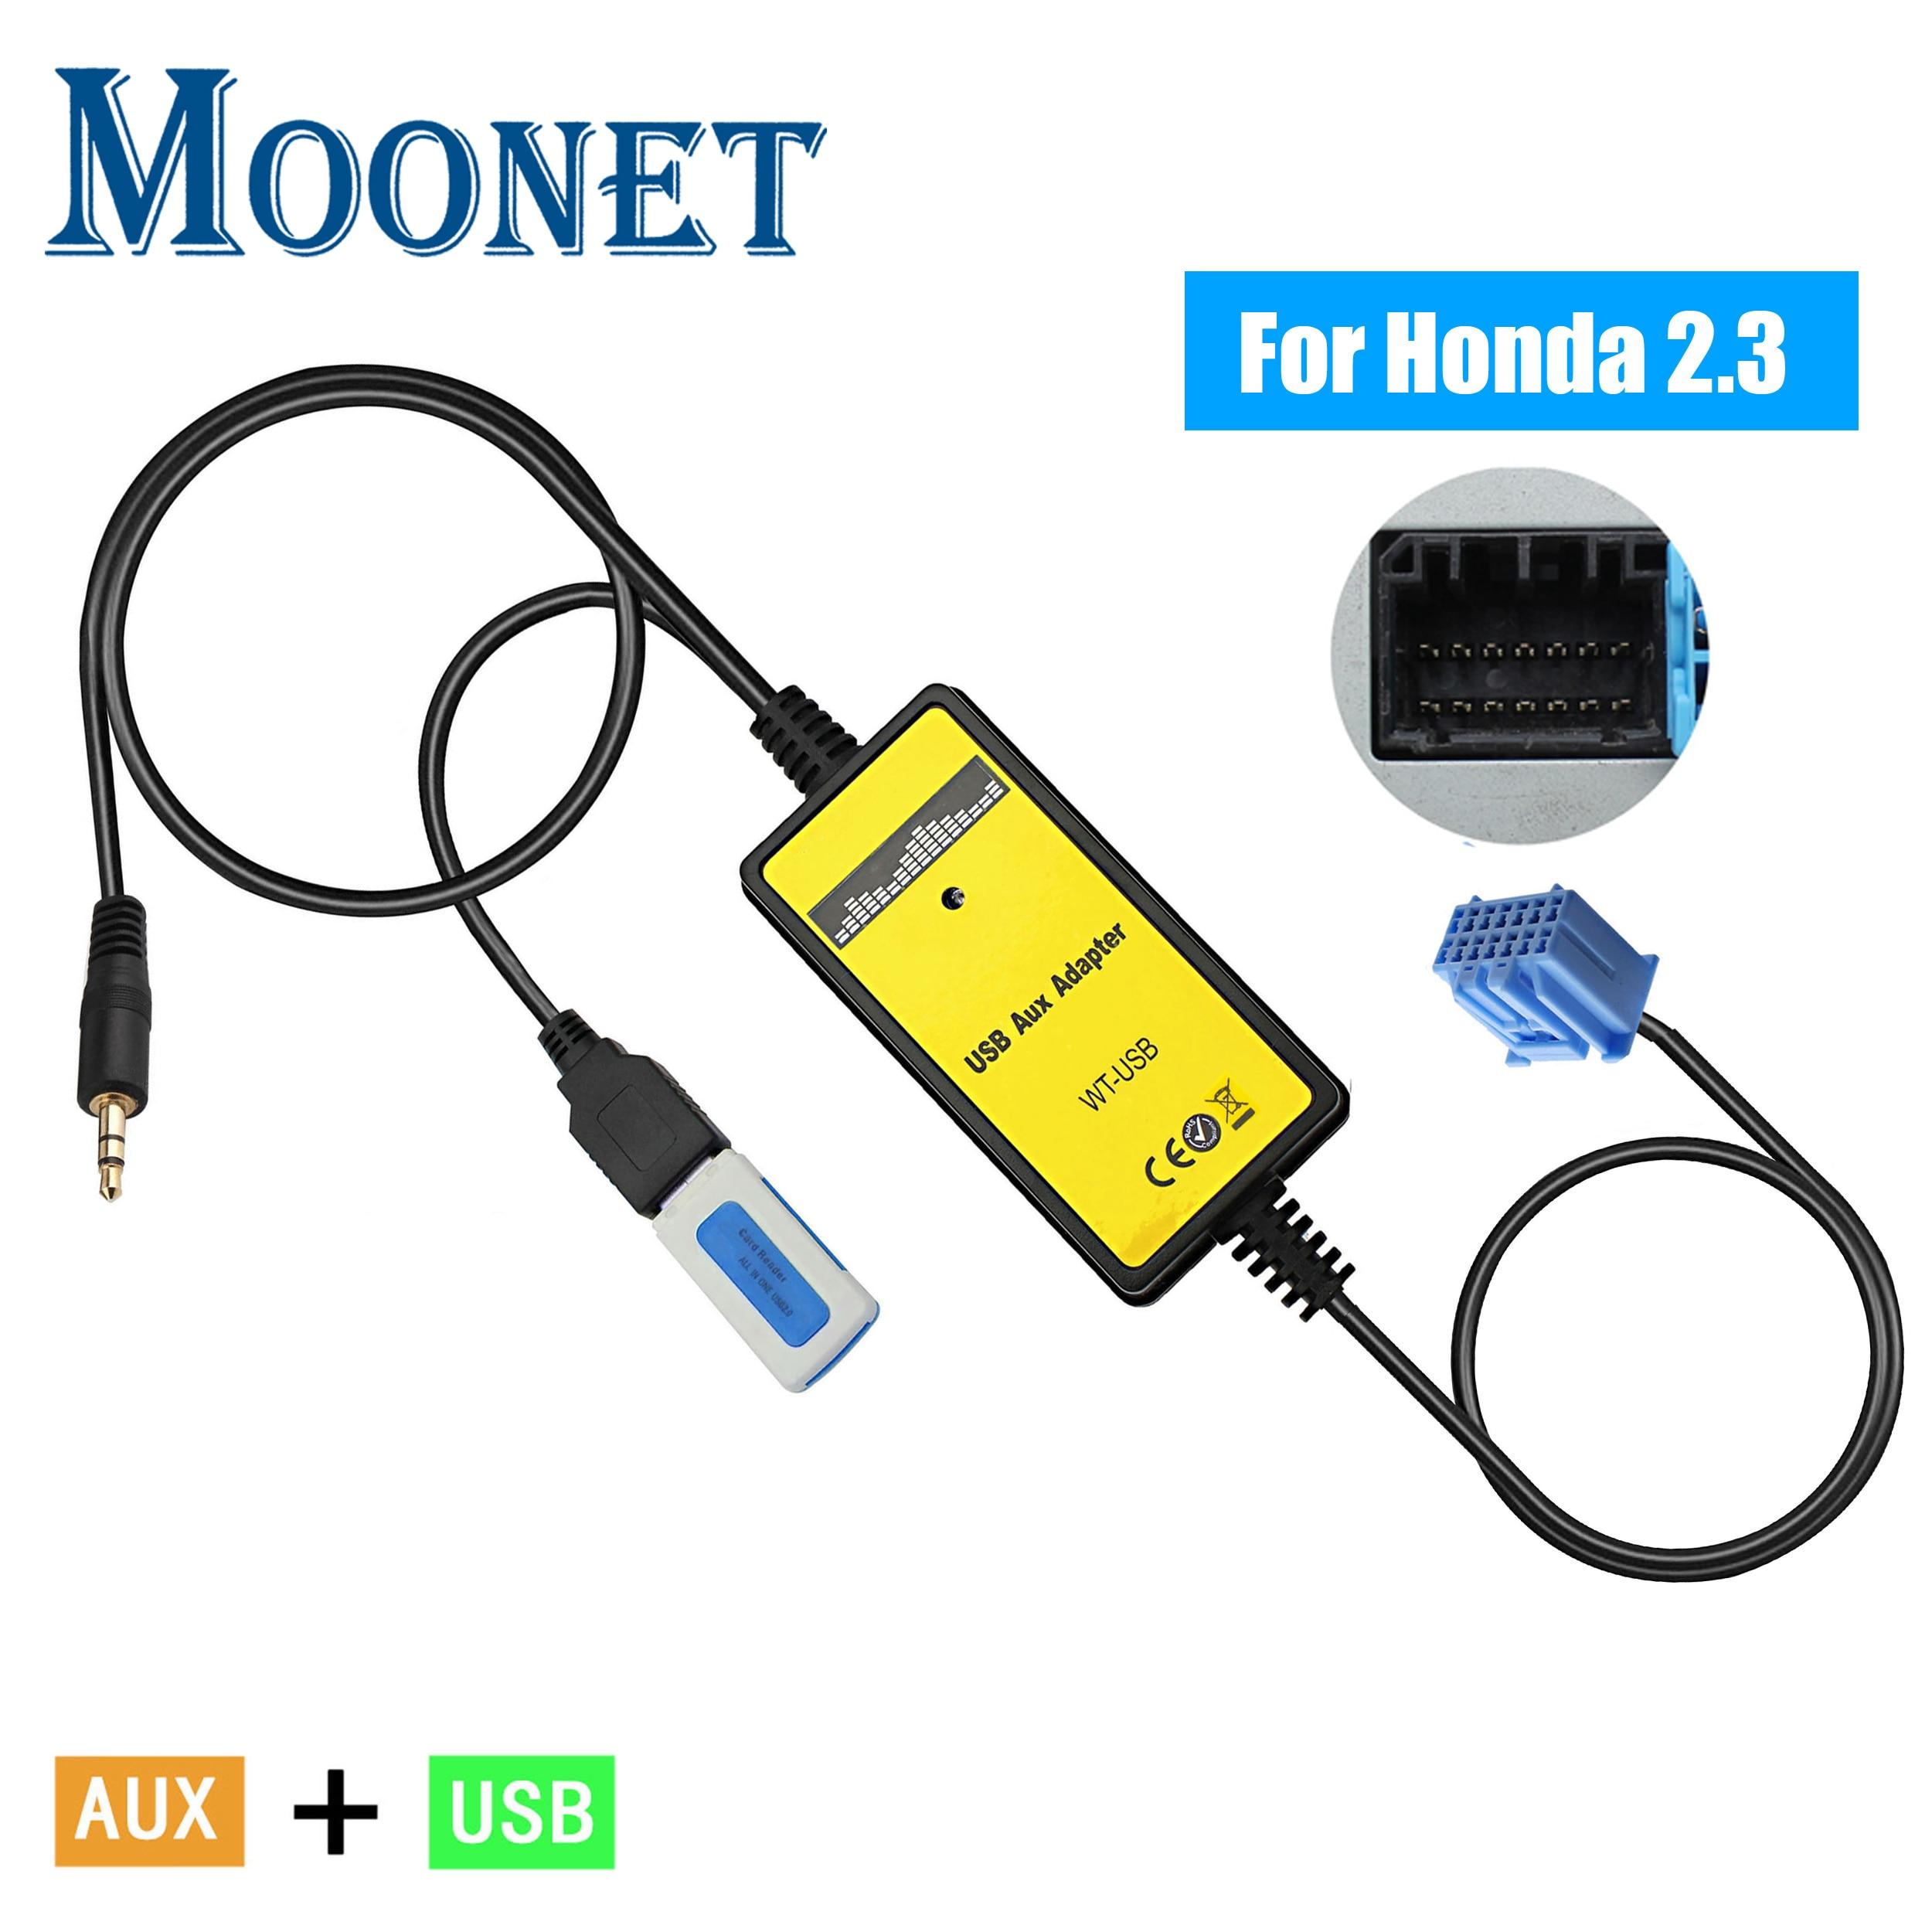 Moonet Car Audio MP3 AUX USB Adapter 3.5mm AUX Interface CD changer For Honda 2.3 Accord Odyssey CRV Pilot S2000 QX006